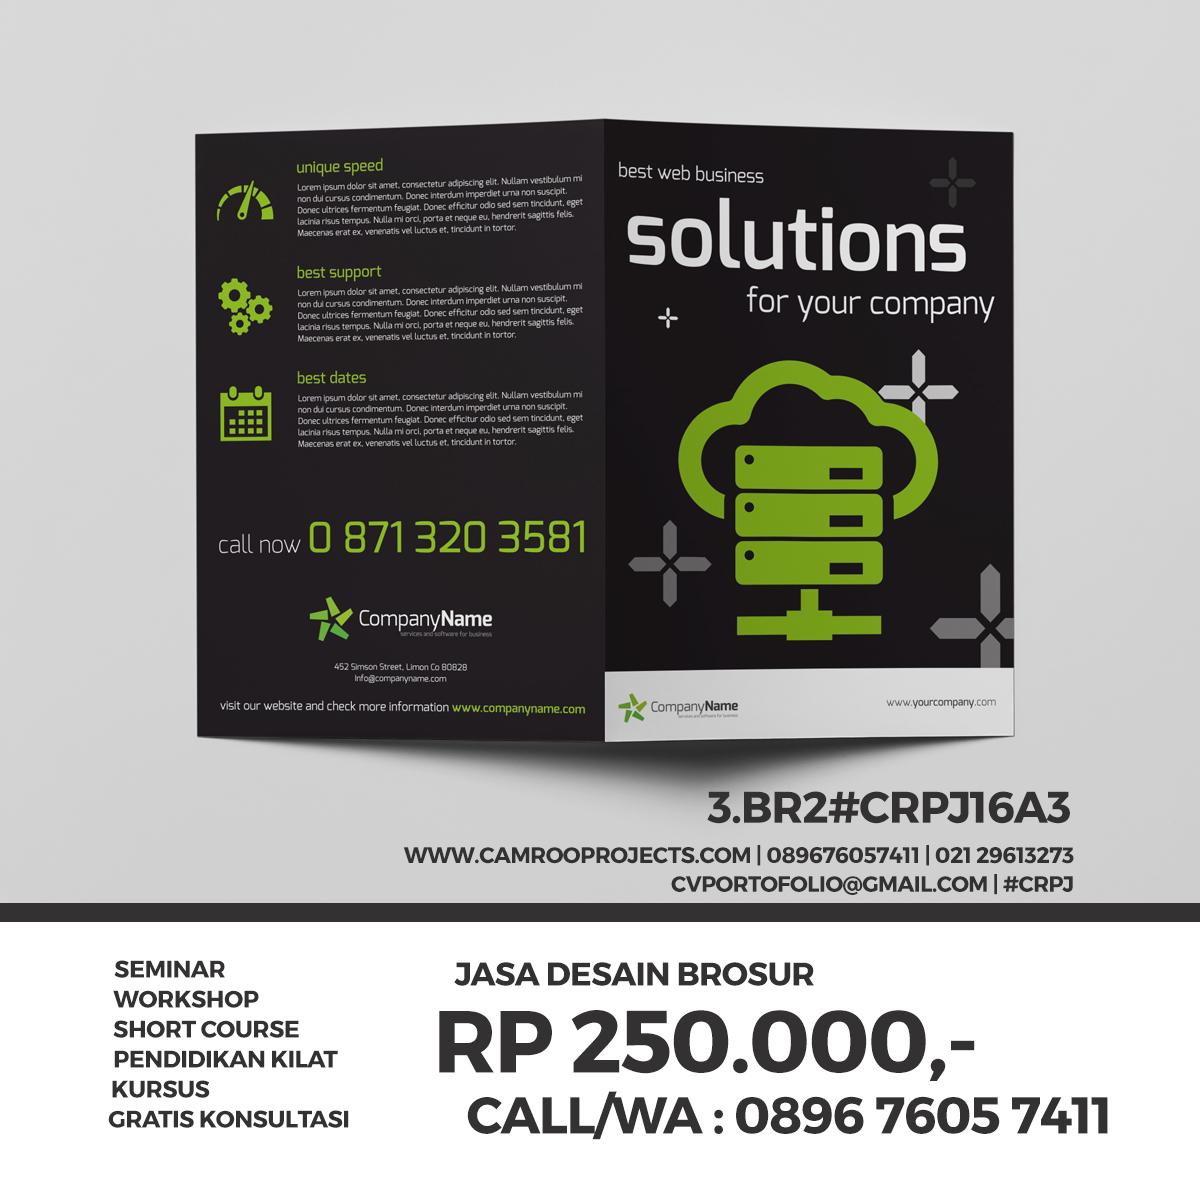 Jasa Desain Flyer   Call/WA 0896 760 574 11